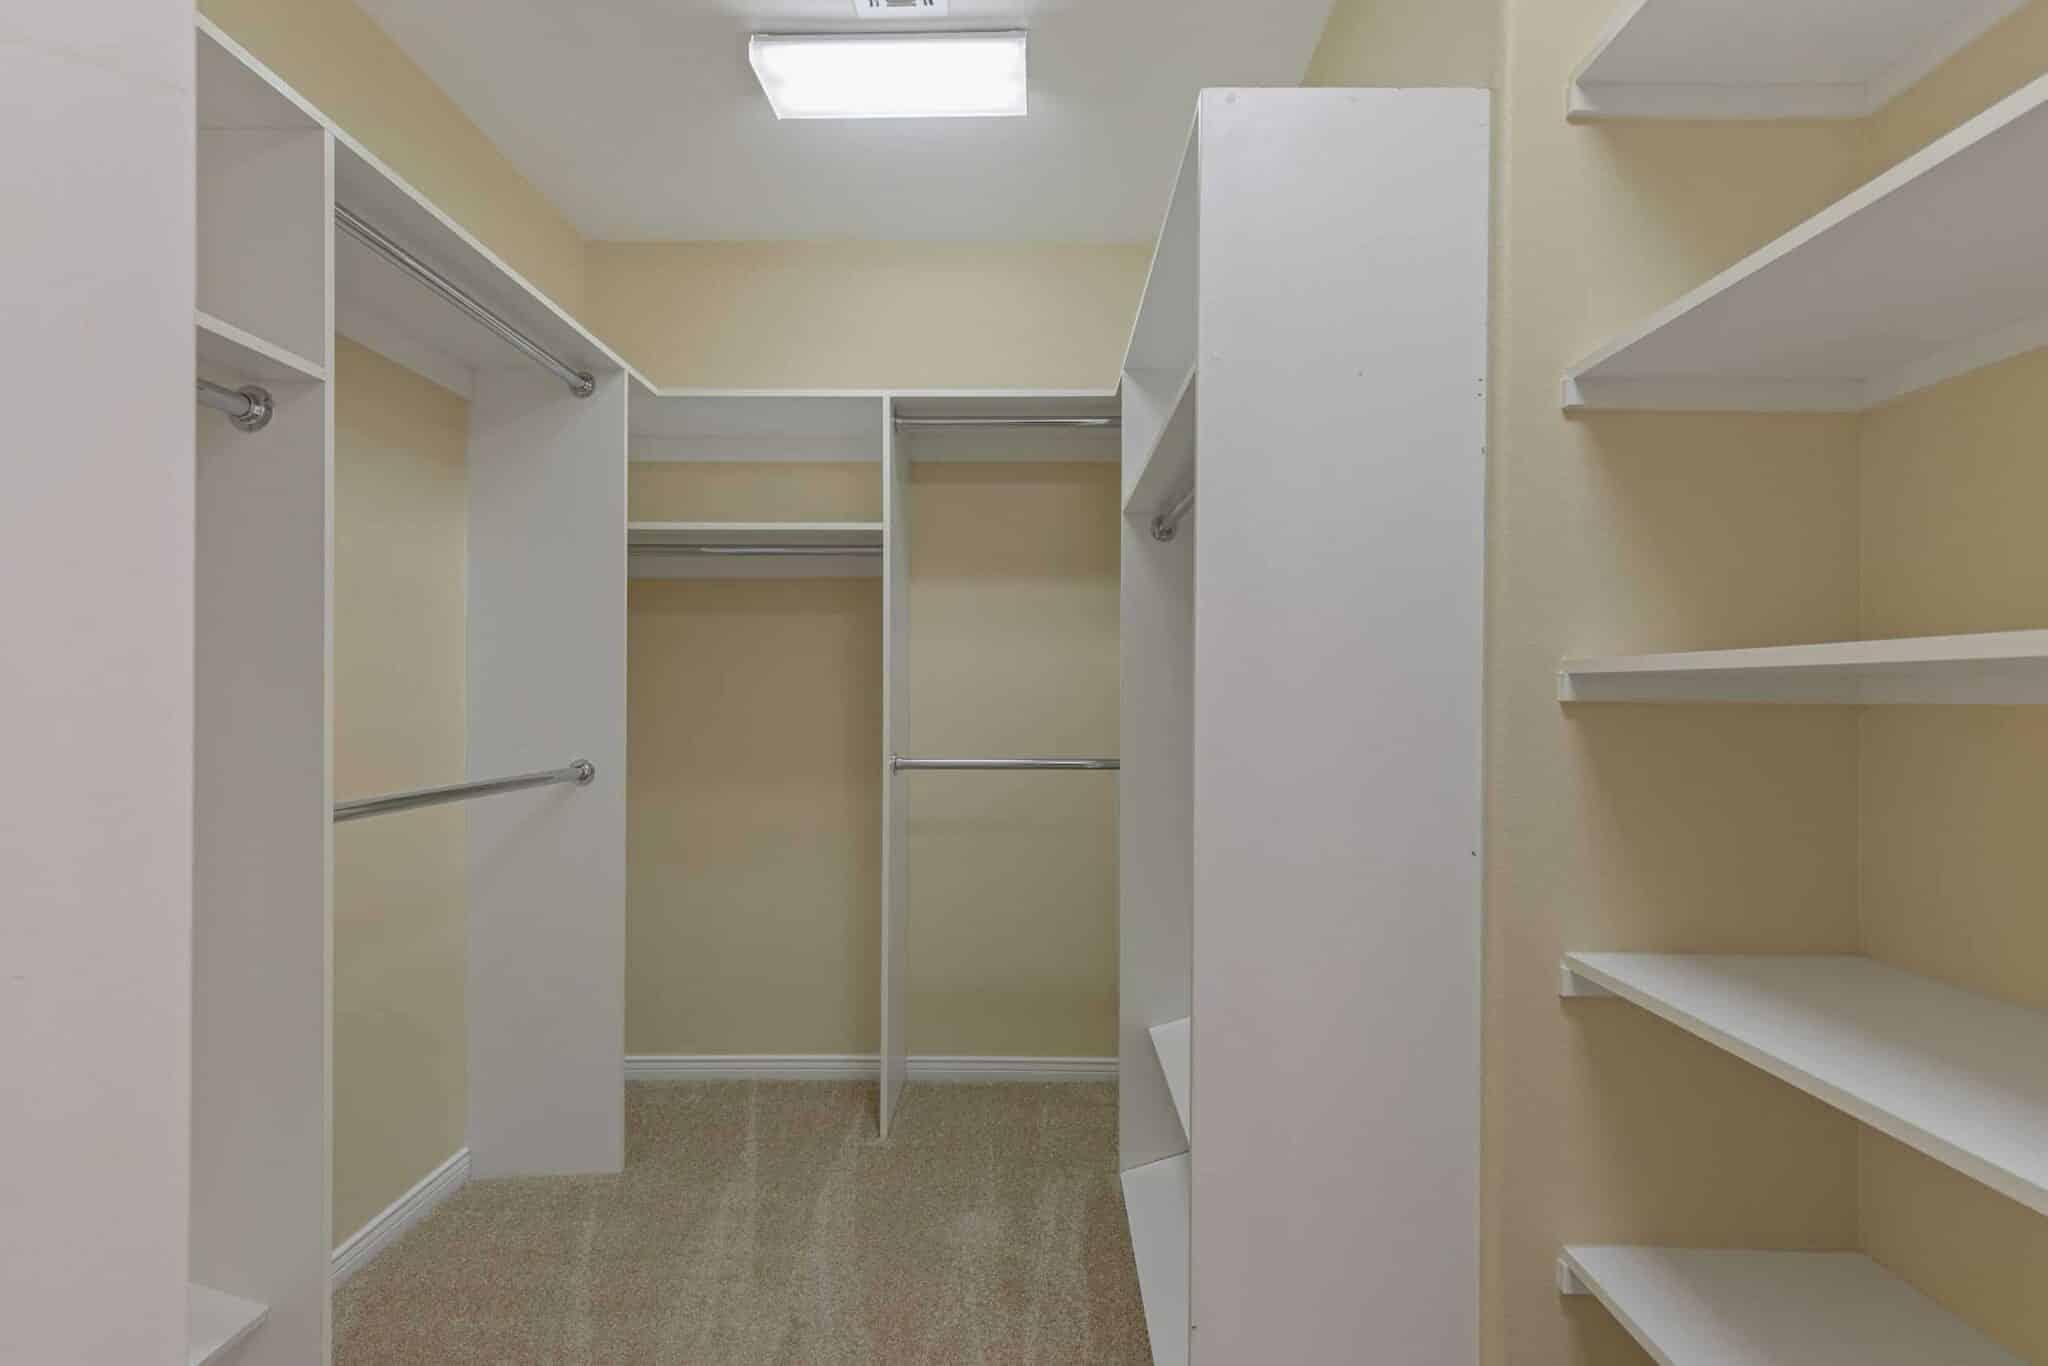 las-vegas-luxry-real-estate-realtor-rob-jensen-company-2620-grassy-spring-place-rrcc41